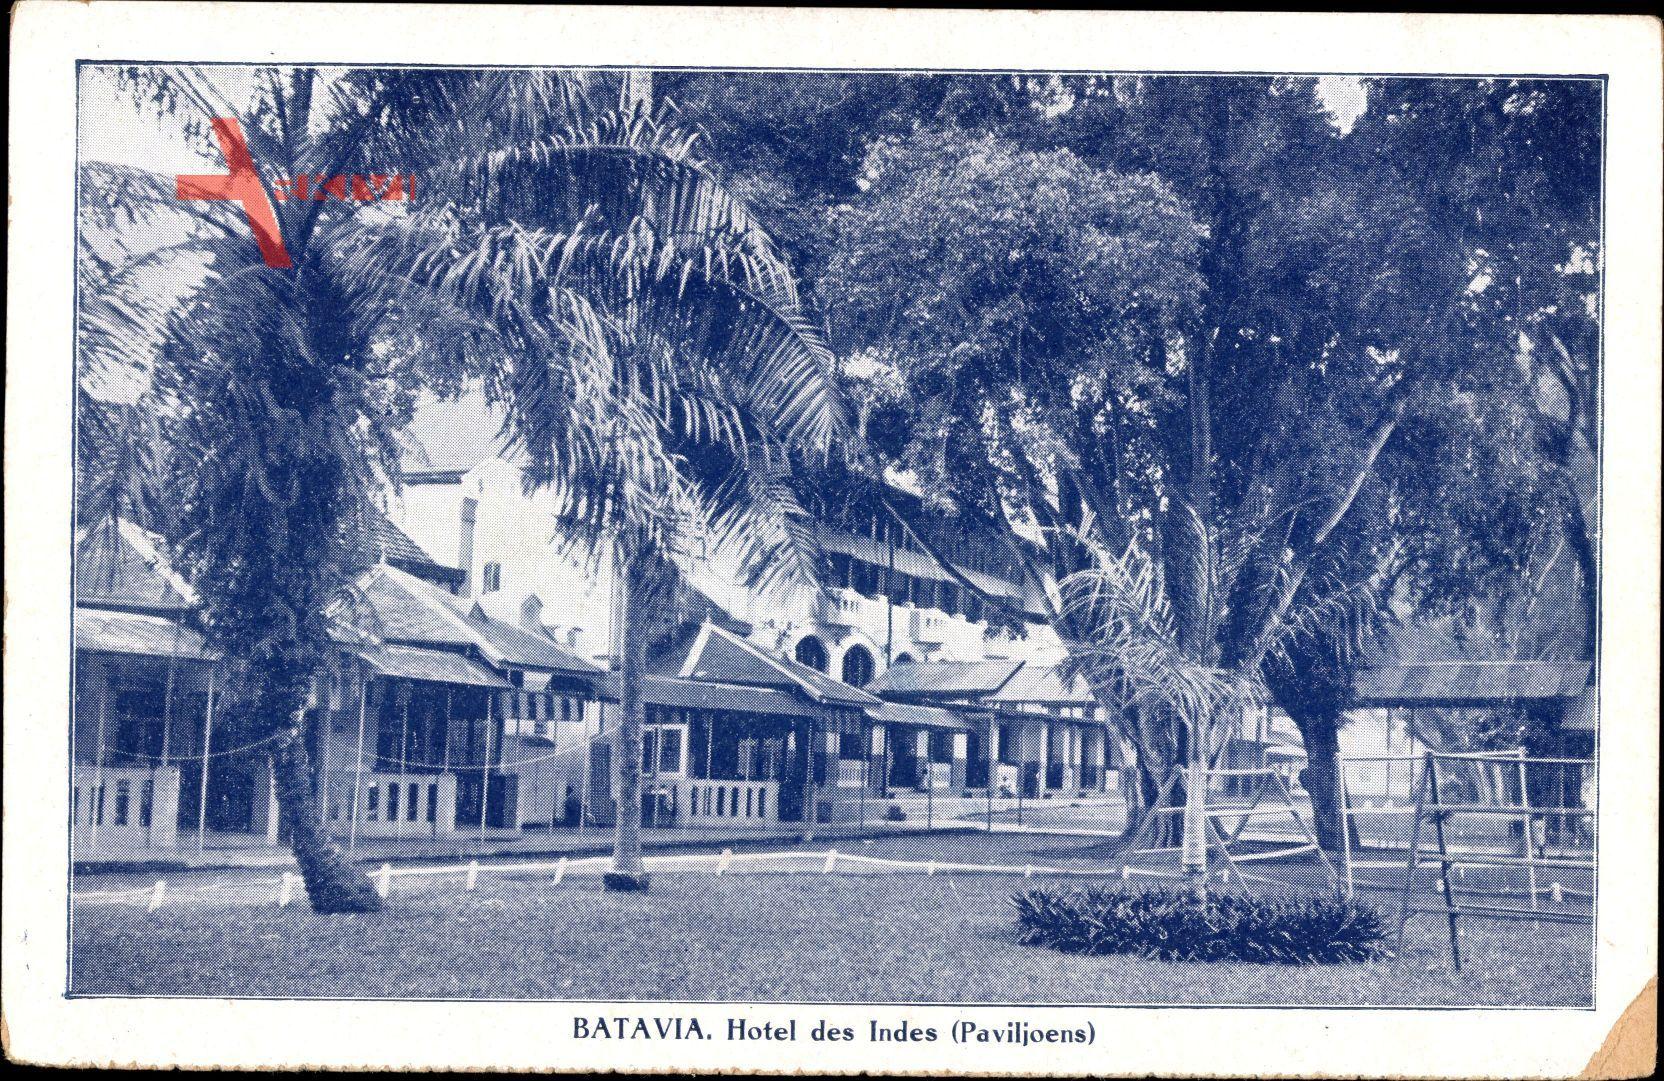 Batavia Jakarta Indonesien, Hotel des Indes, Paviljoens, Palmen